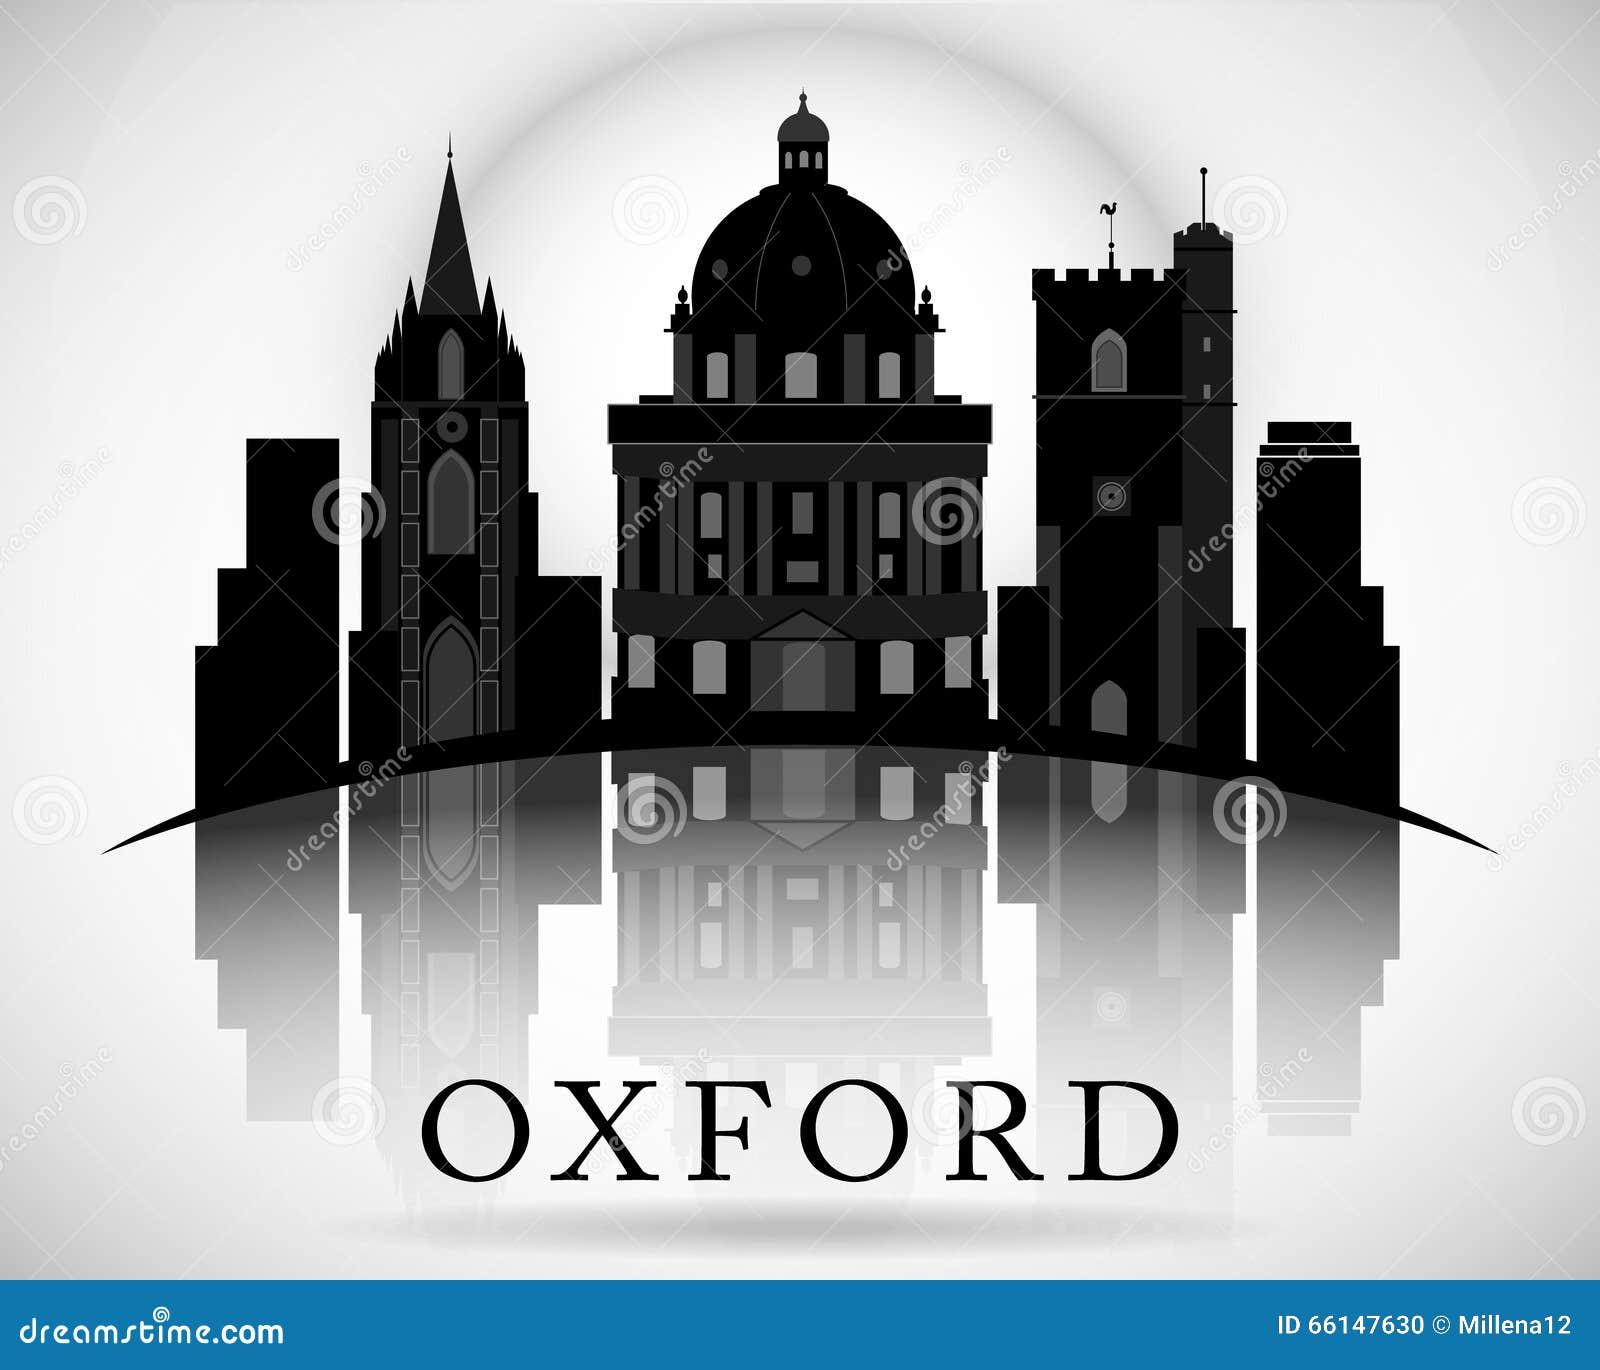 Modern Oxford City Skyline Design. England